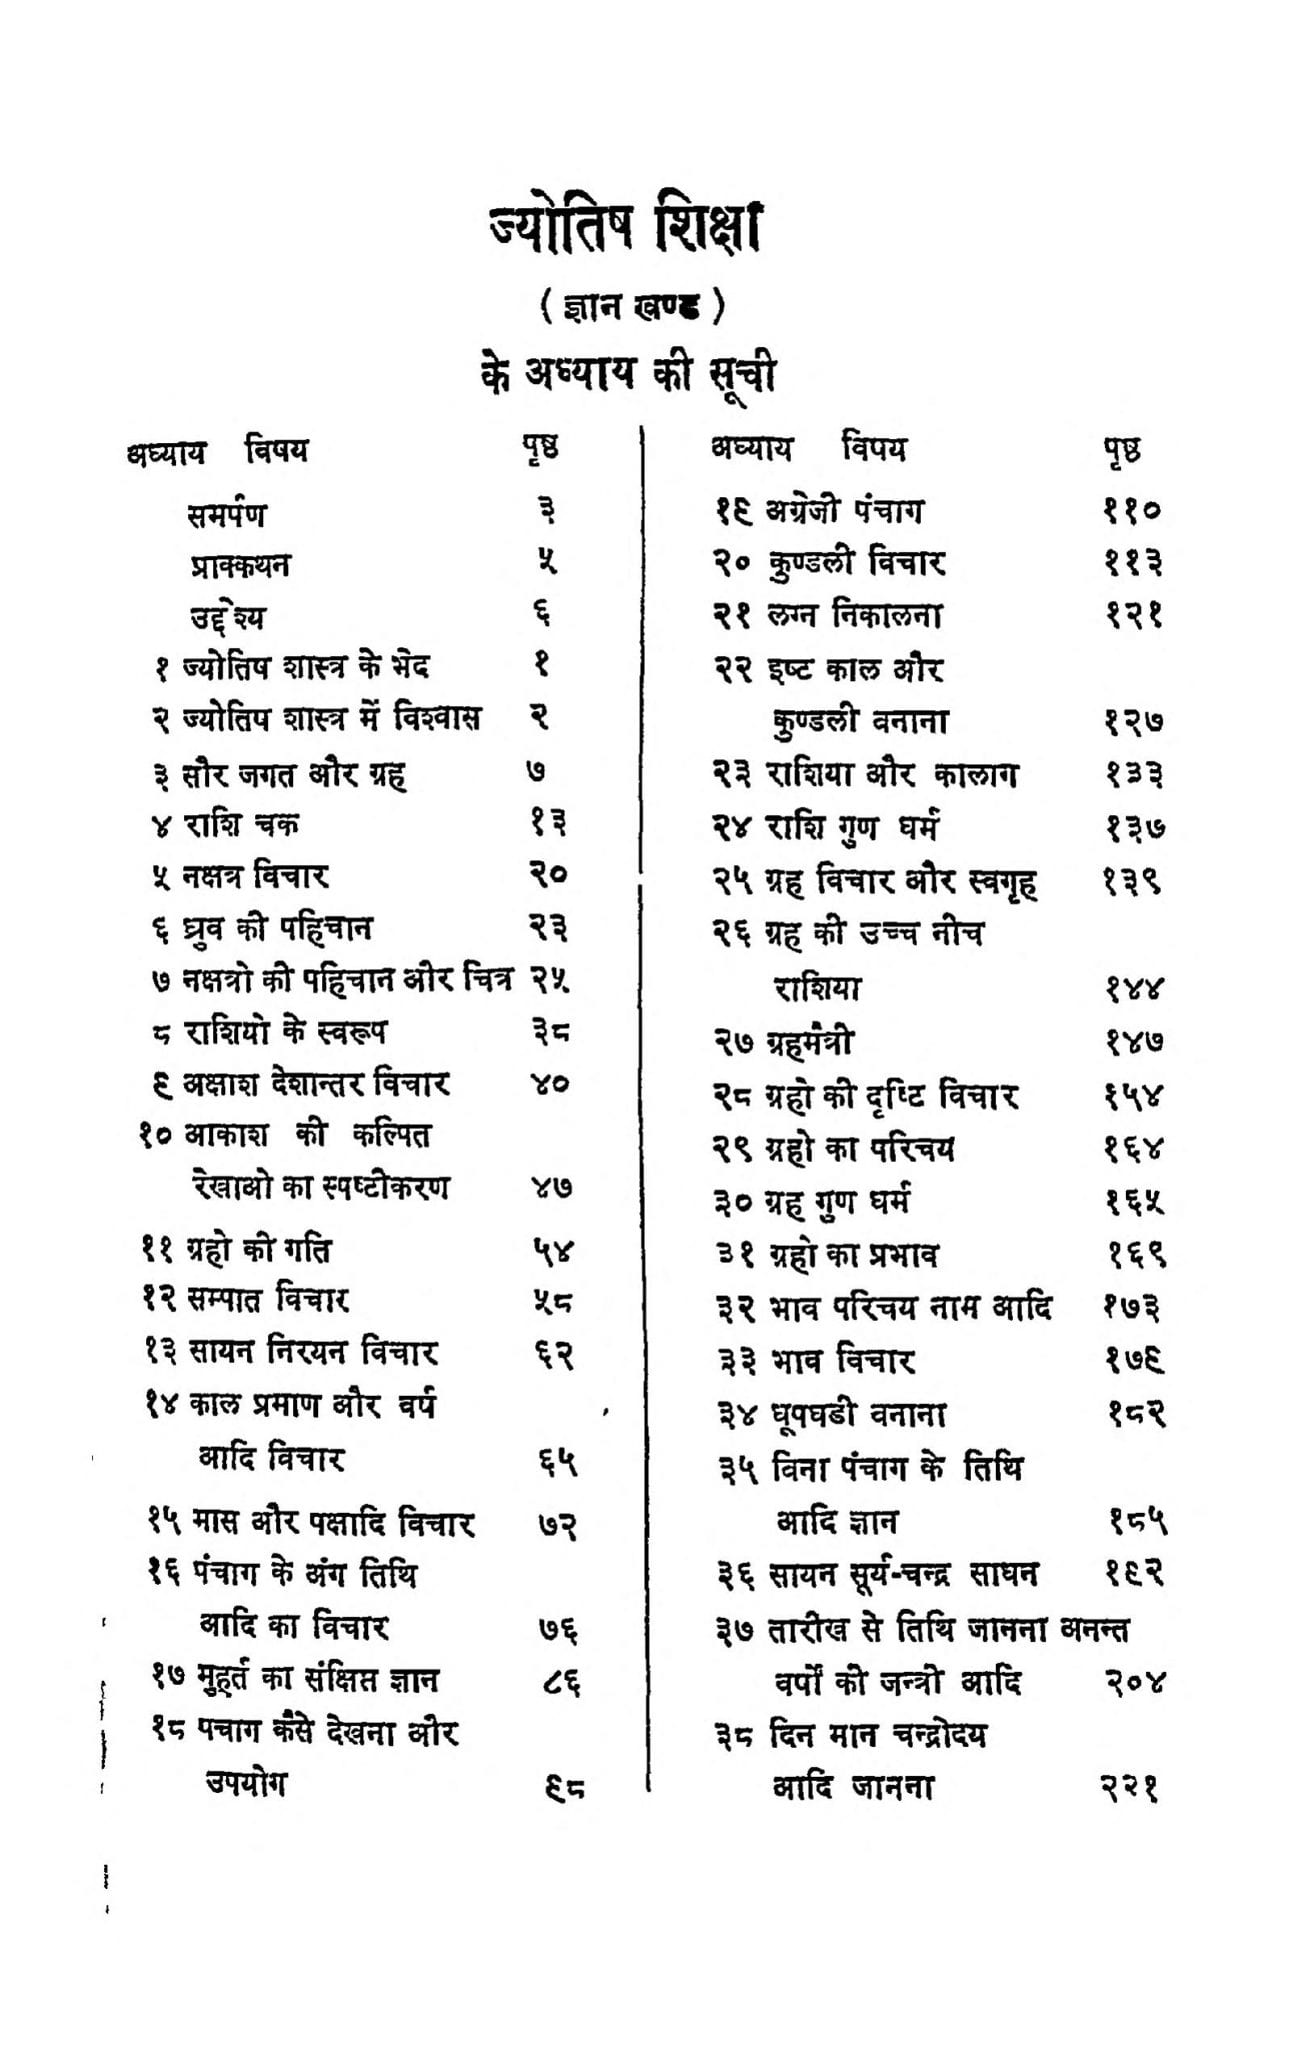 Sachitra Jyotish Shiksha  prarmbhik Gyan Khand by श्री ठाकुर चन्द्र - Shri Thakur Chandra